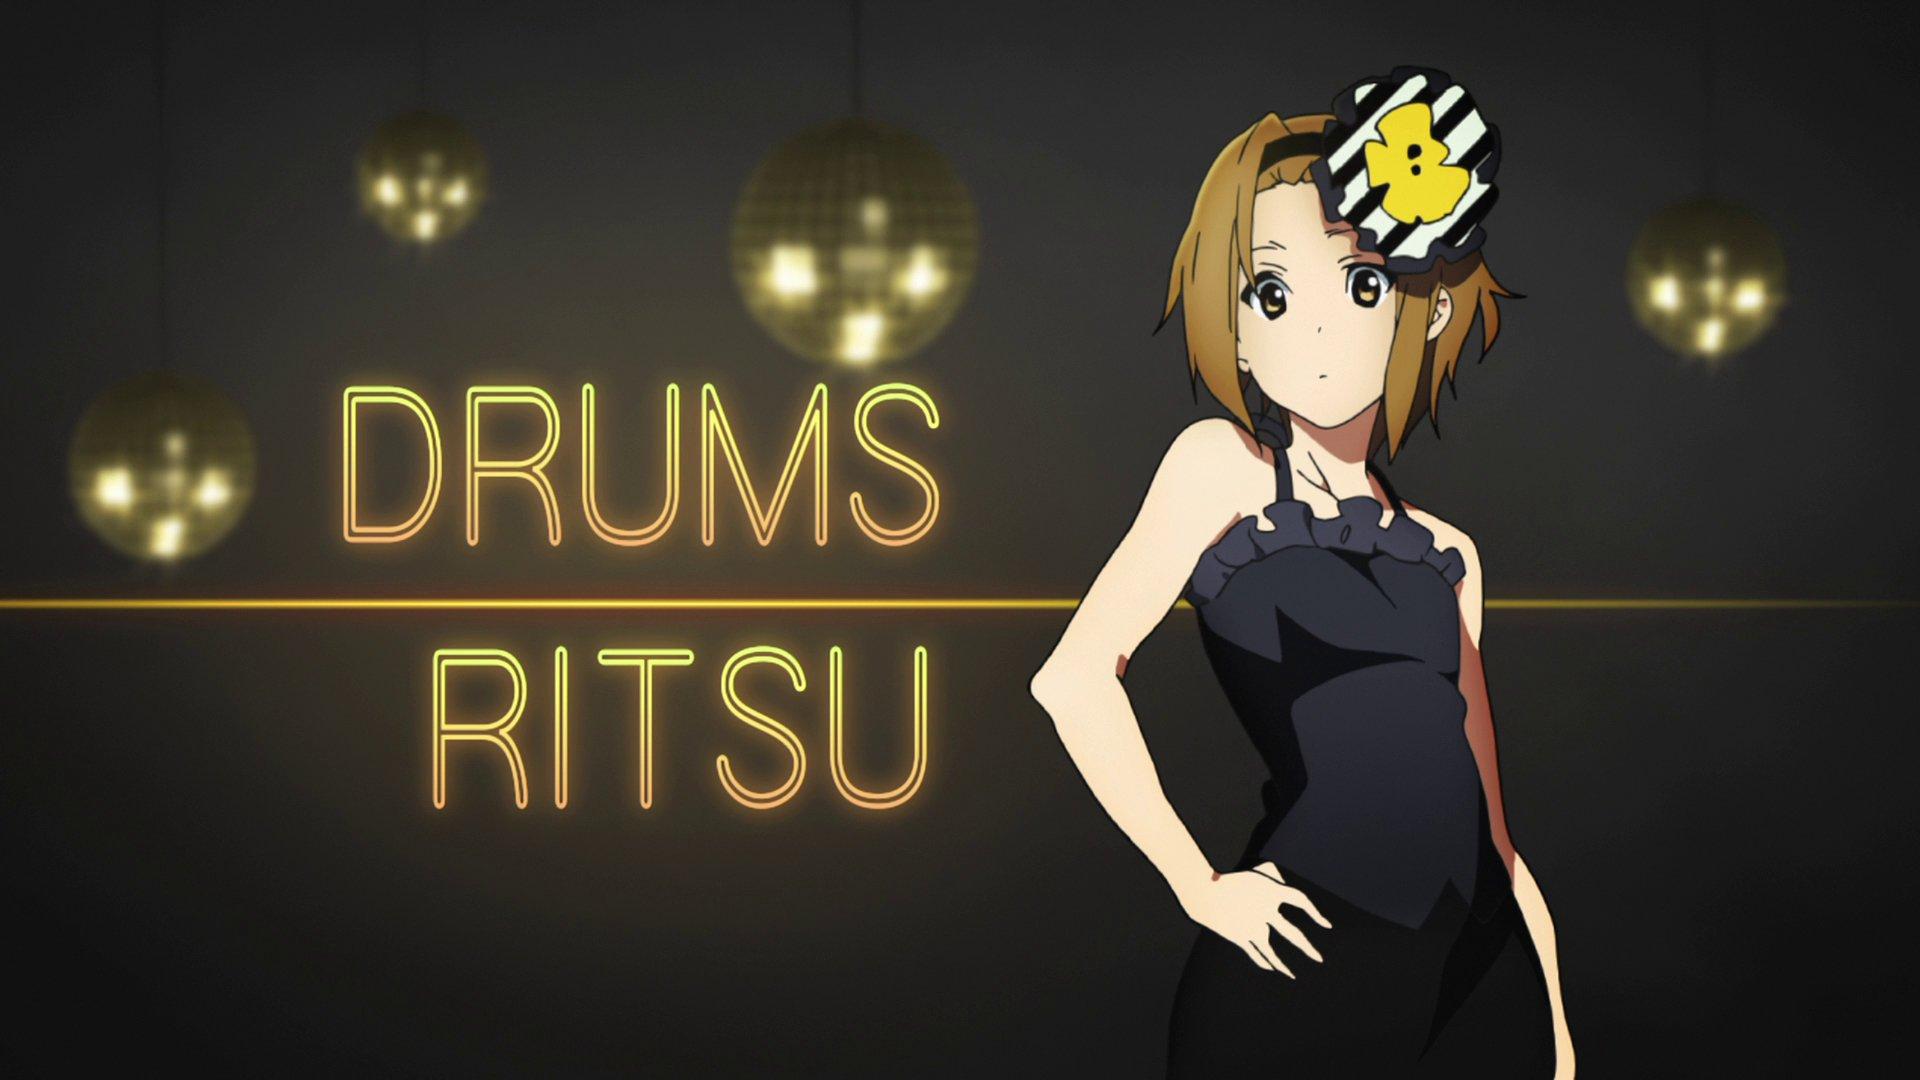 Ritsu-chan Full HD Wallpaper and Background Image ...